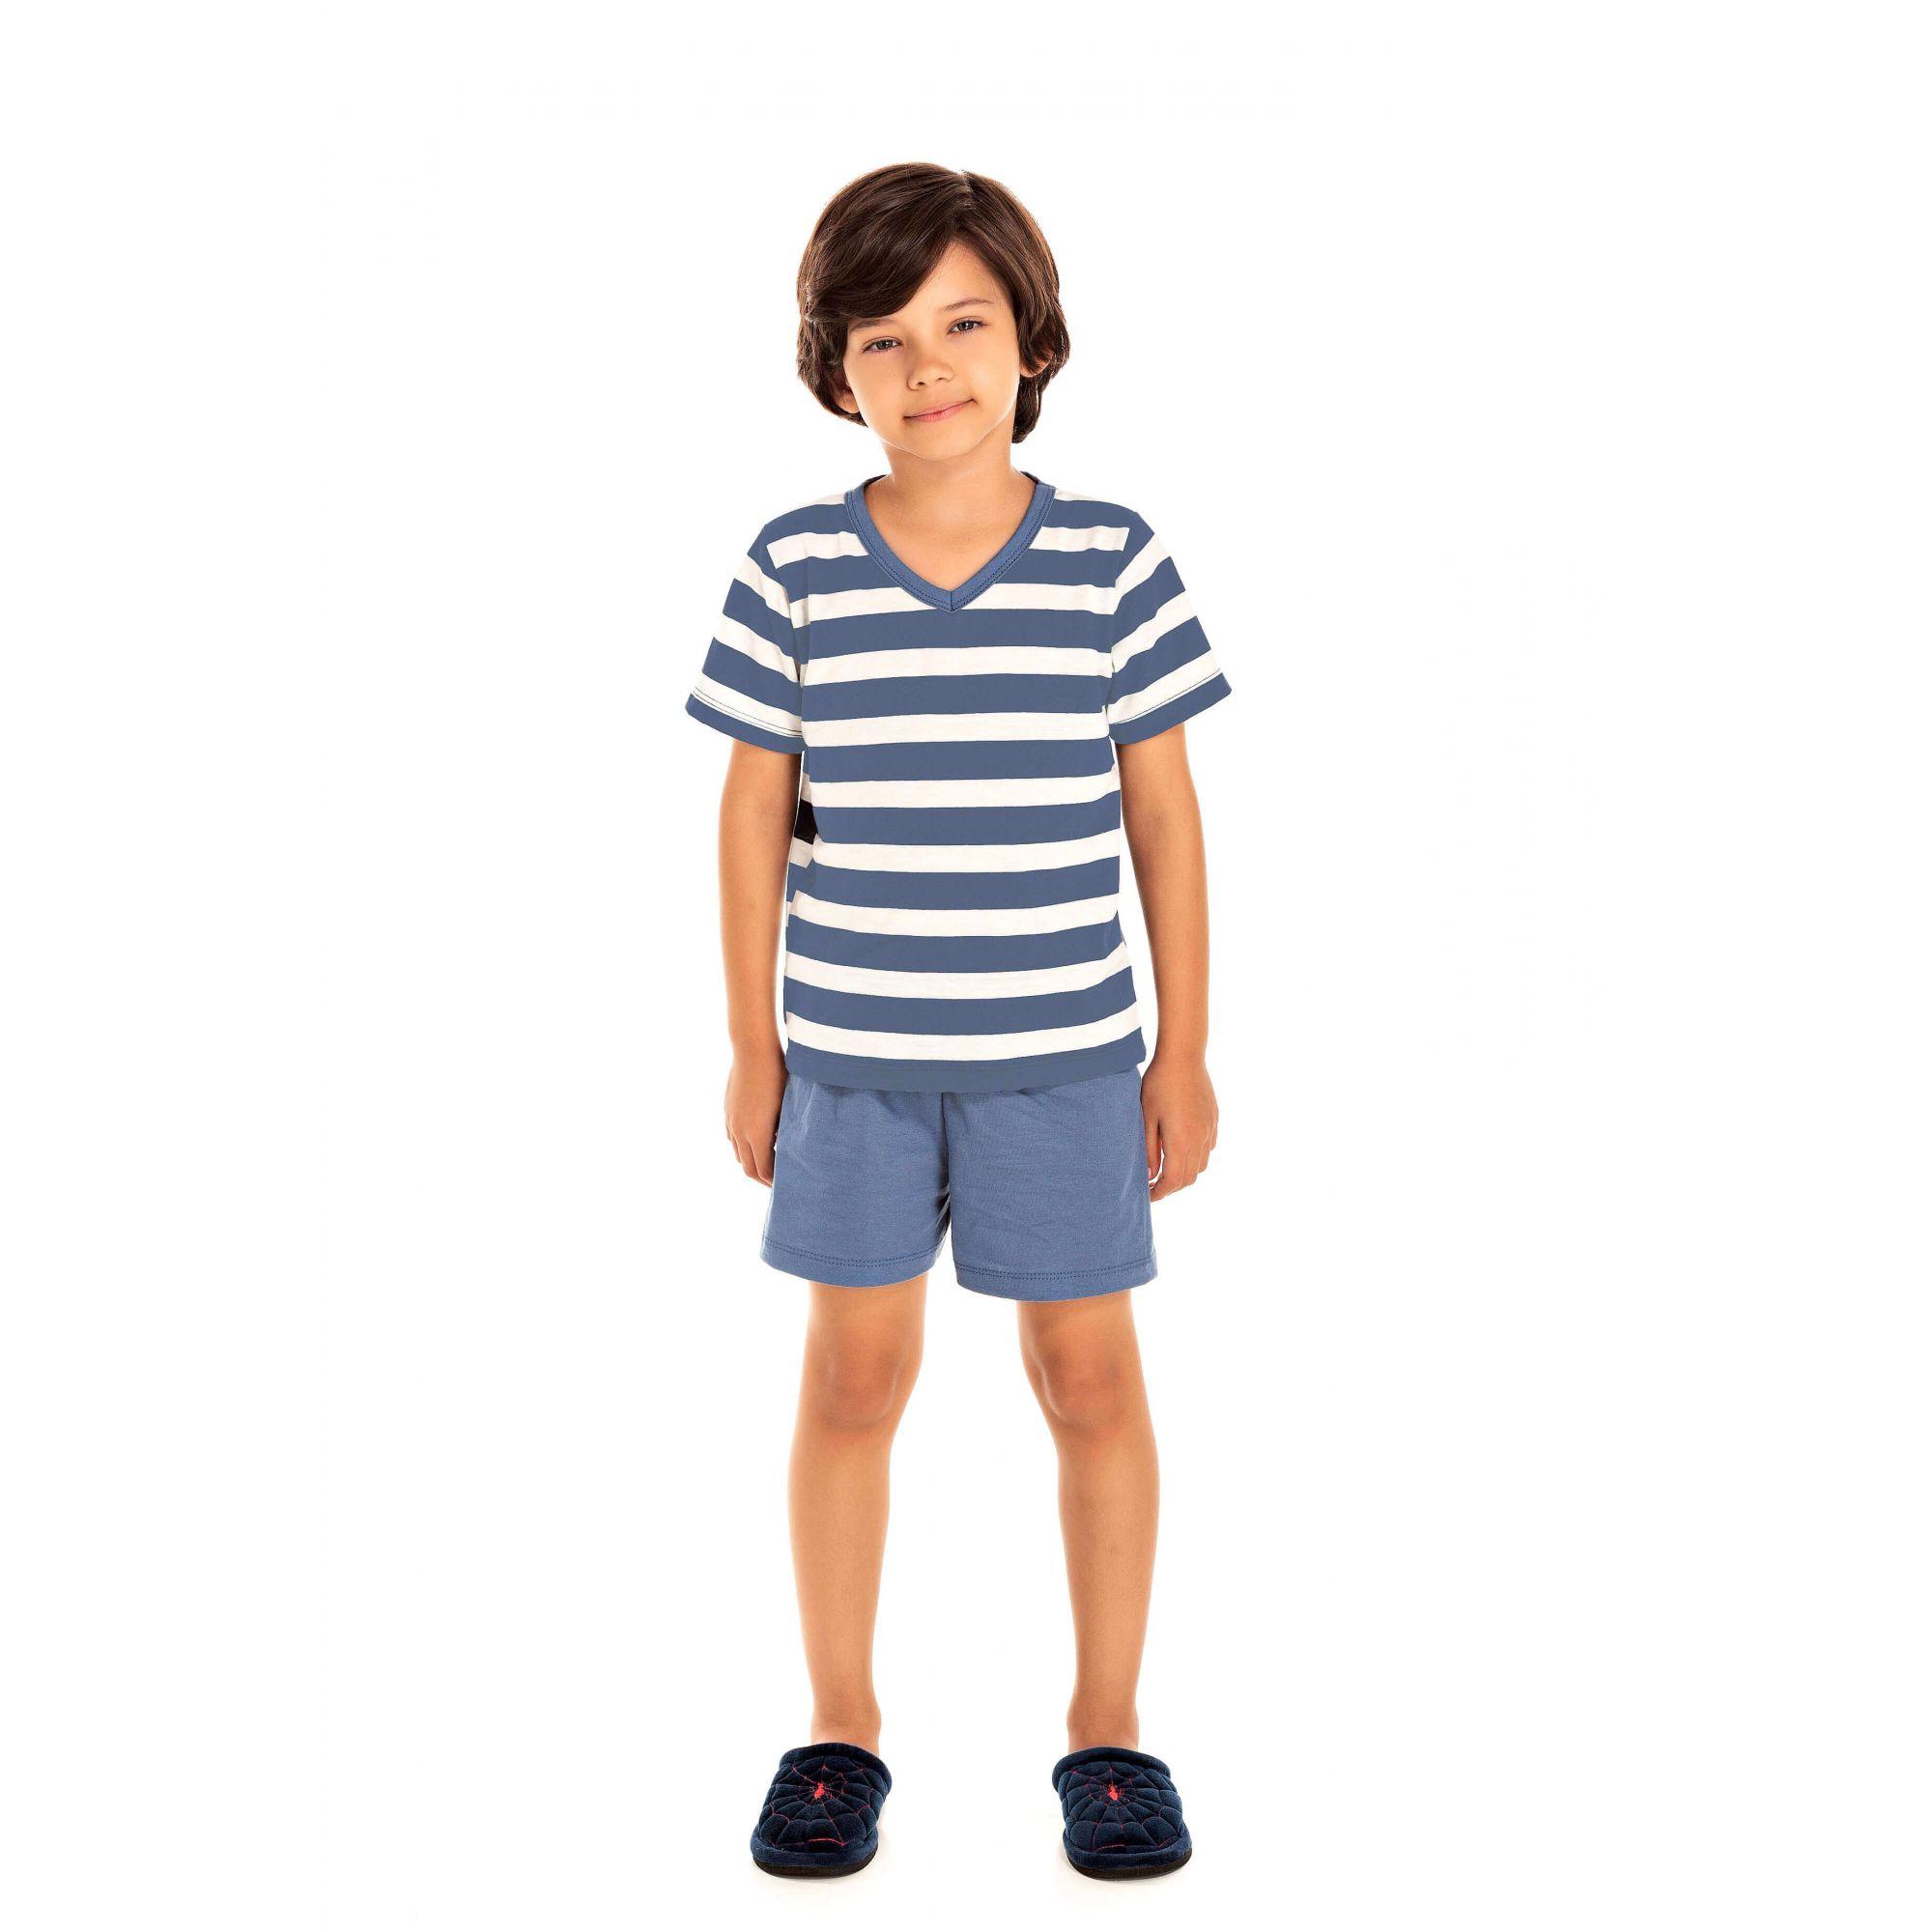 044 - Pijama Infantil Curto - Pai e Filho